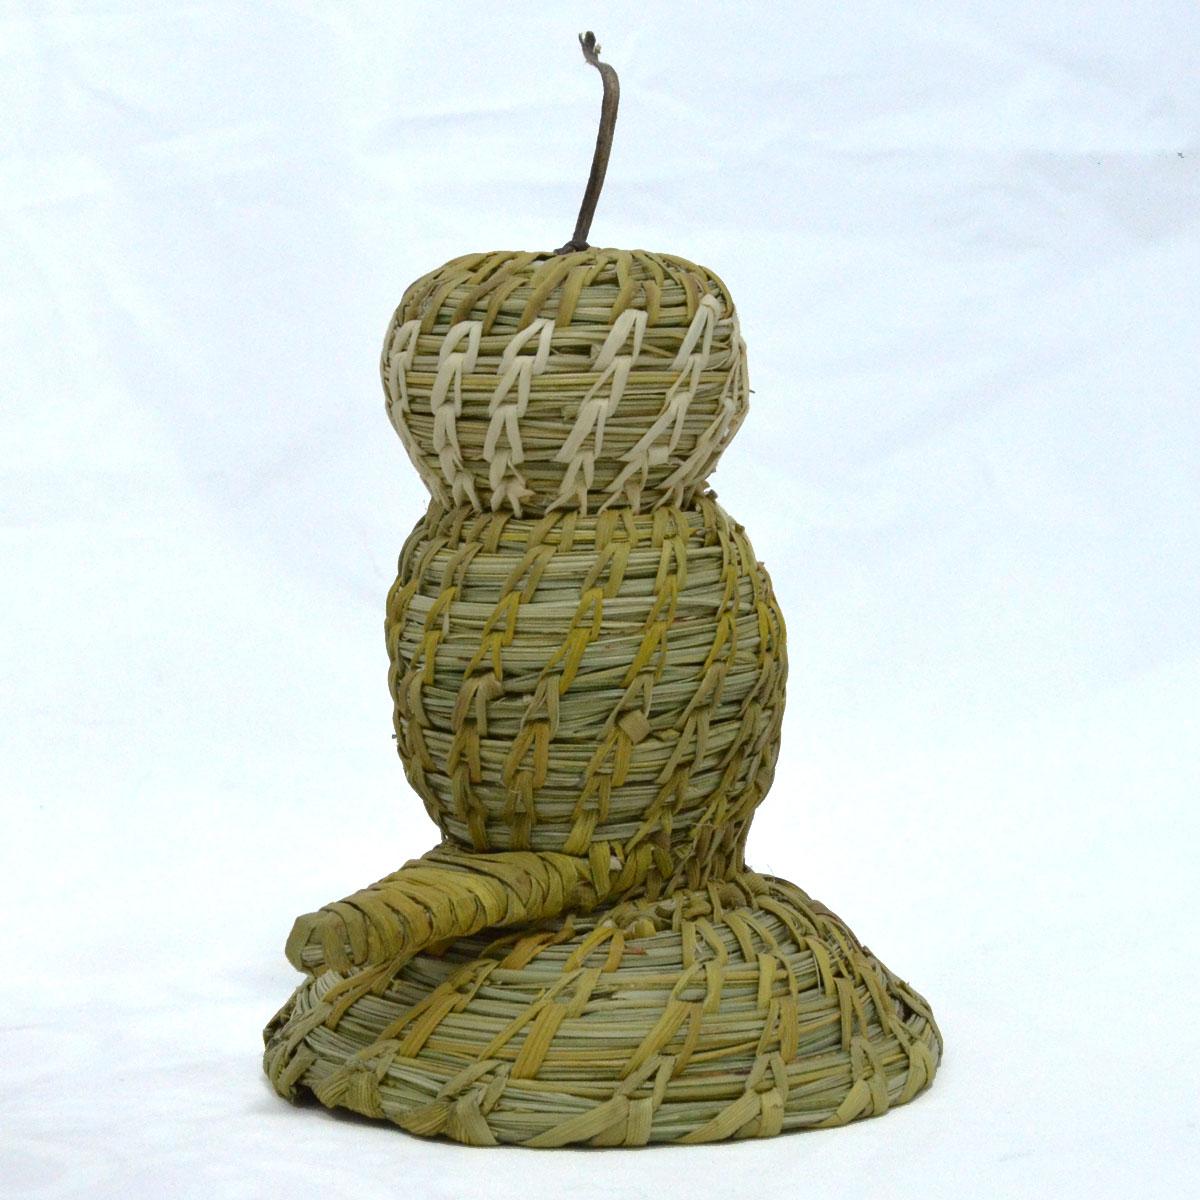 Contemporary Fred and Della Cruz, Tohono O'odham: Quail Basket Birds